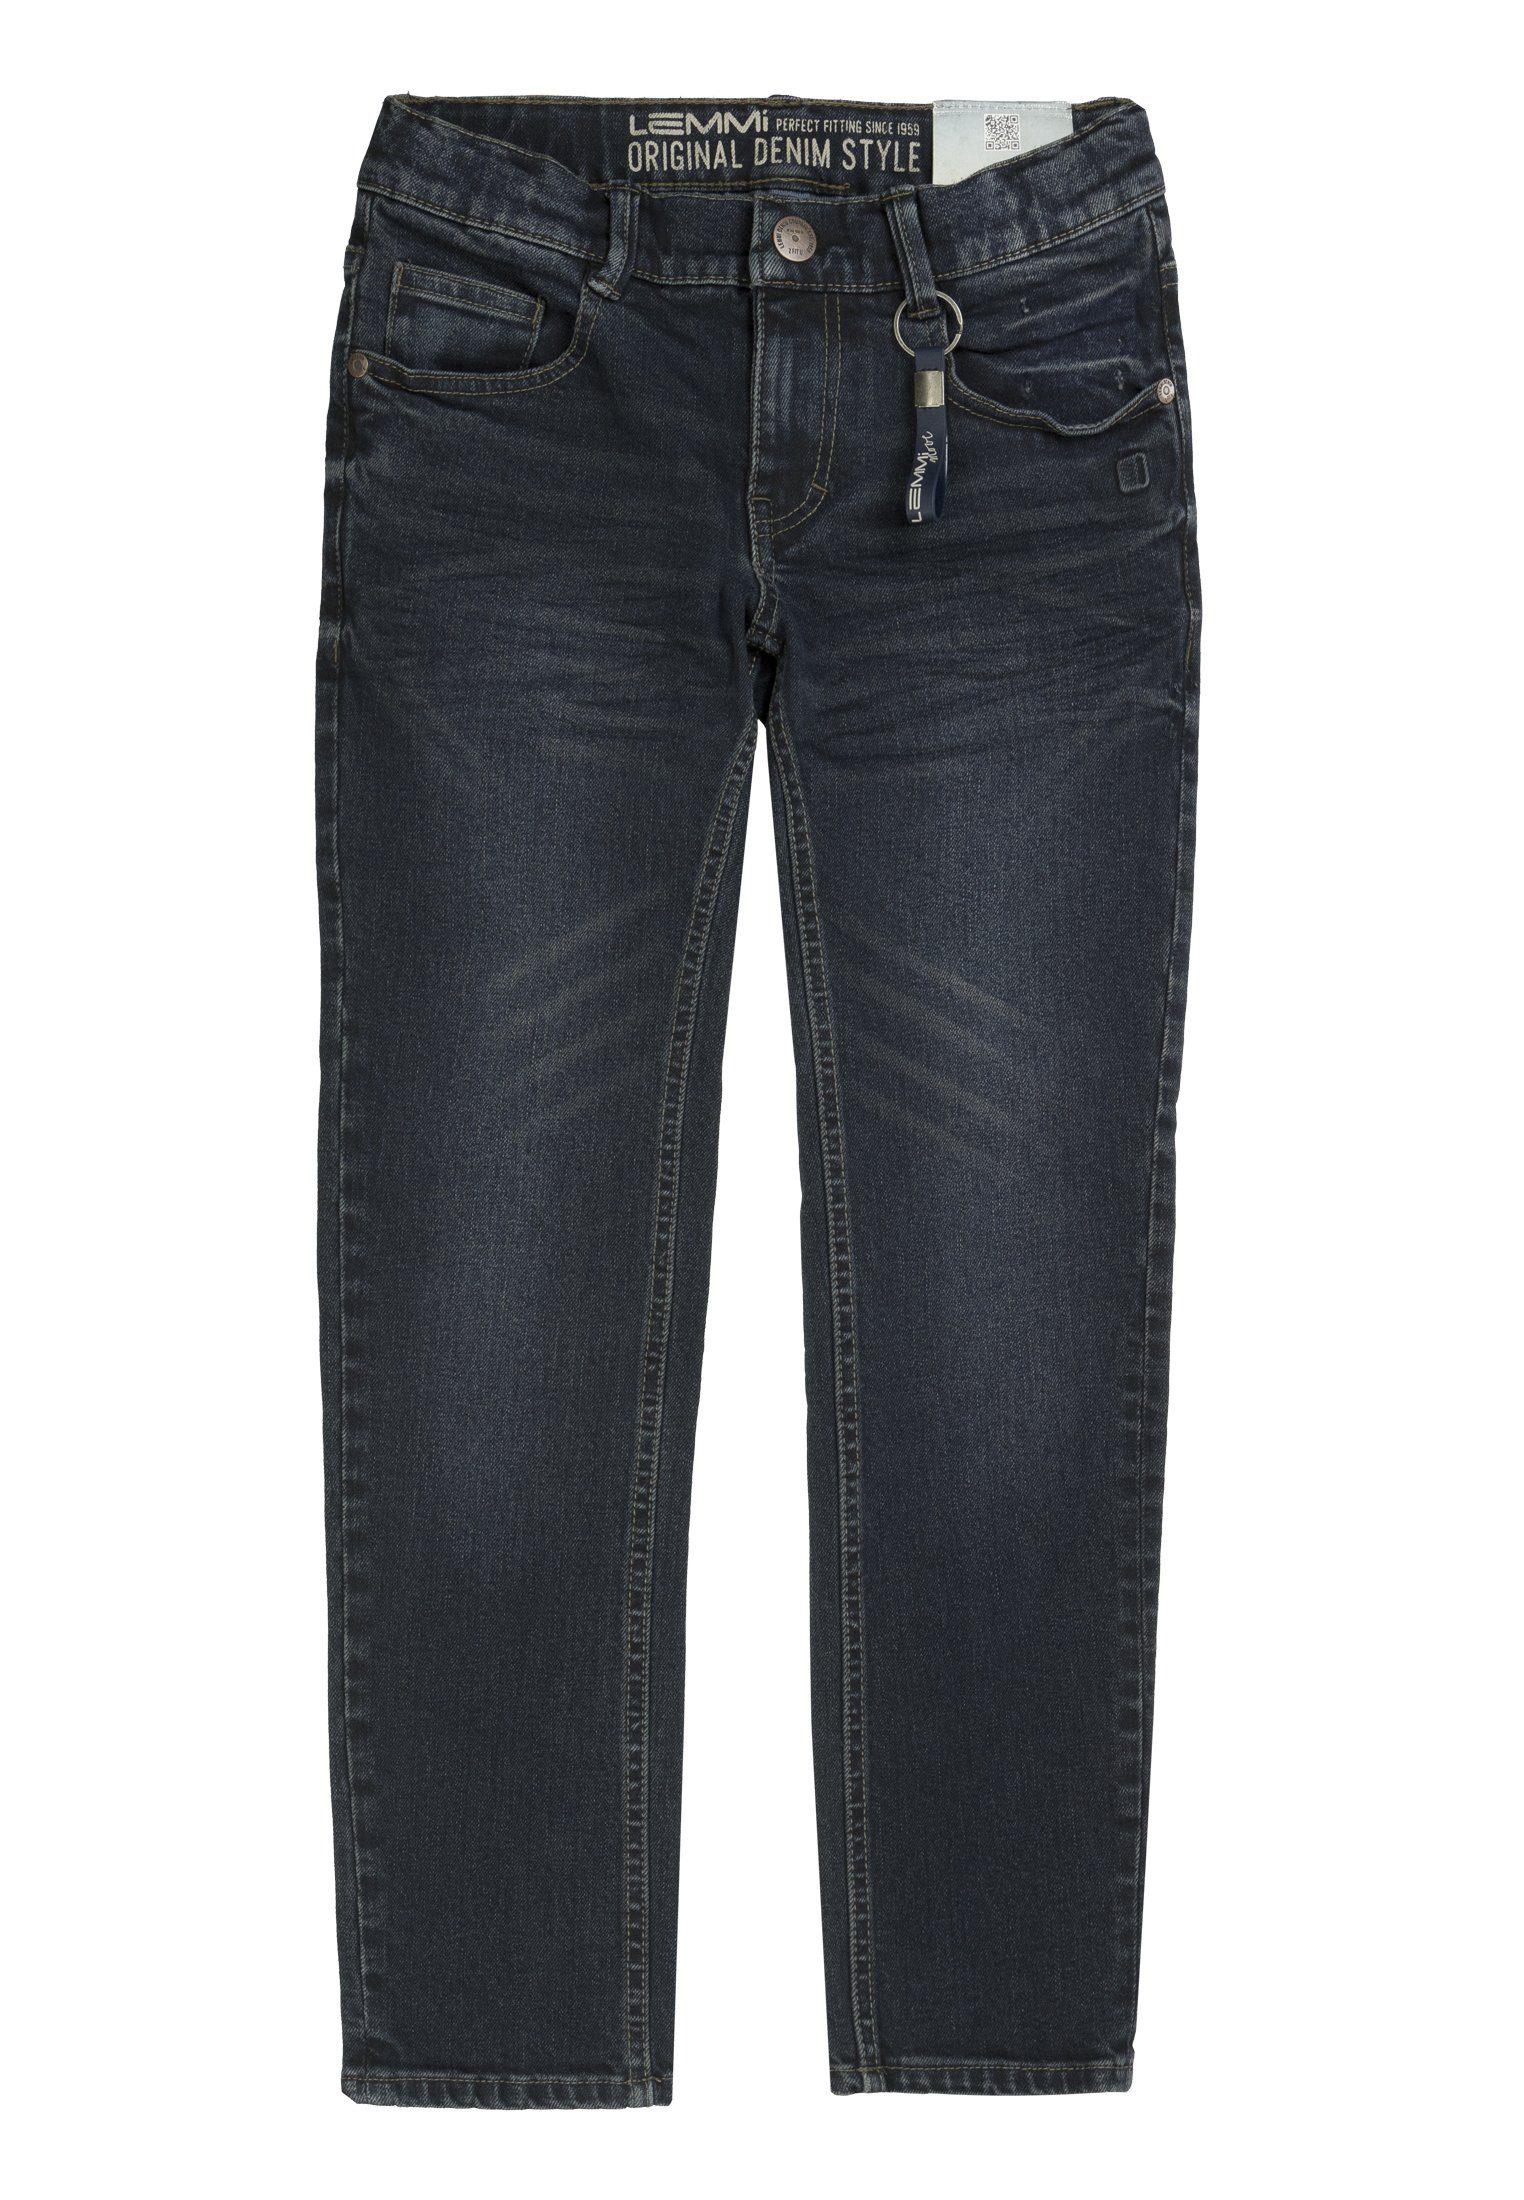 Lemmi Hose Jeans Boys regular fit BIG